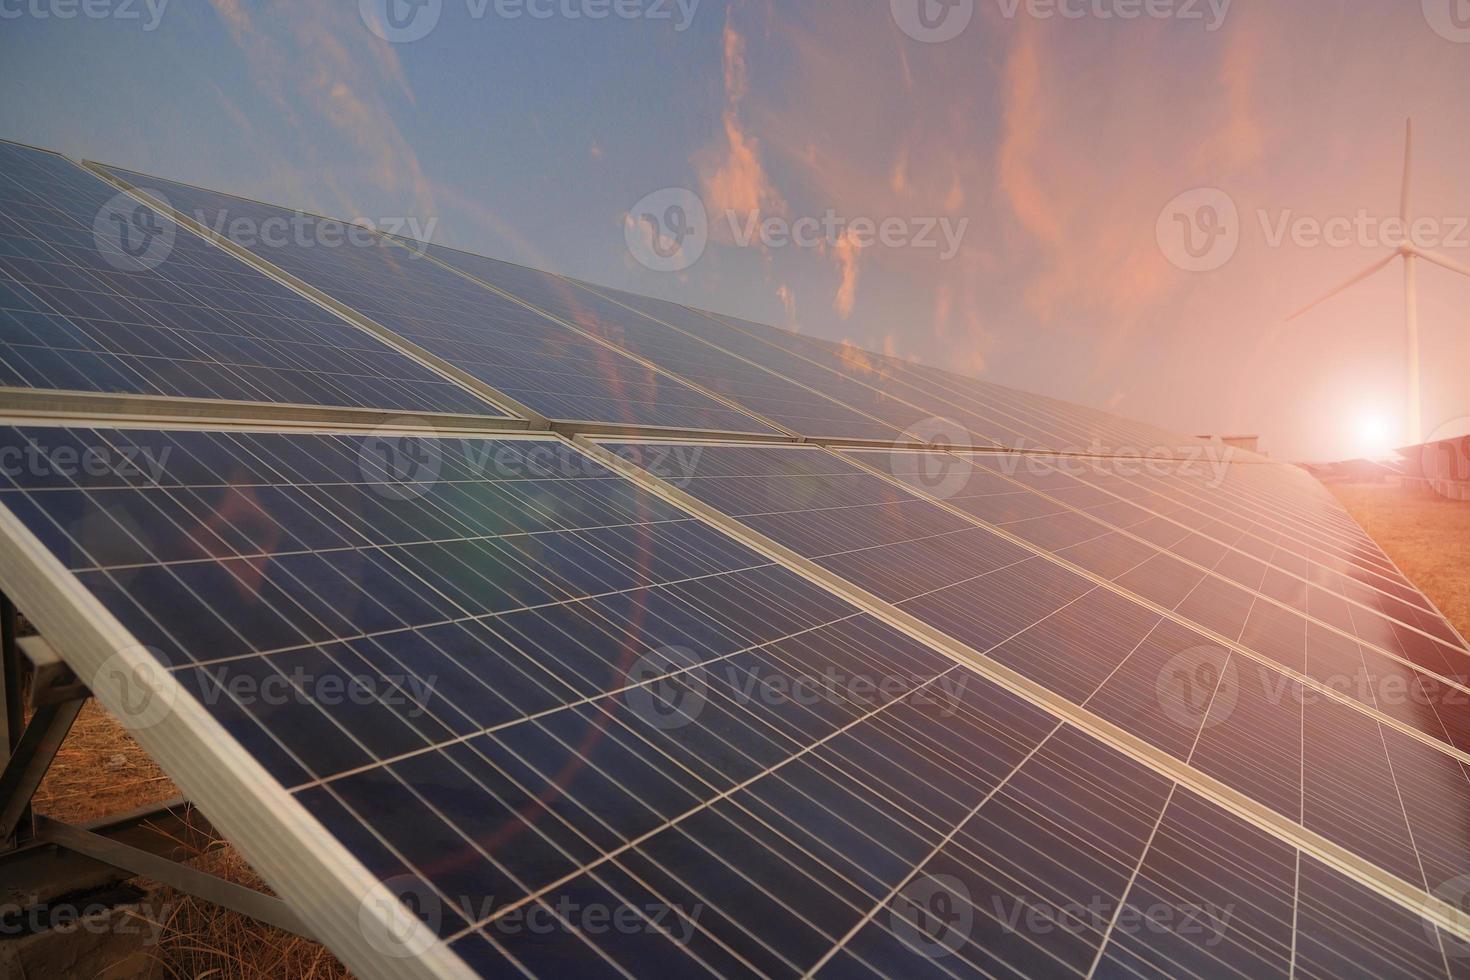 Power plant using renewable solar energy with sun photo